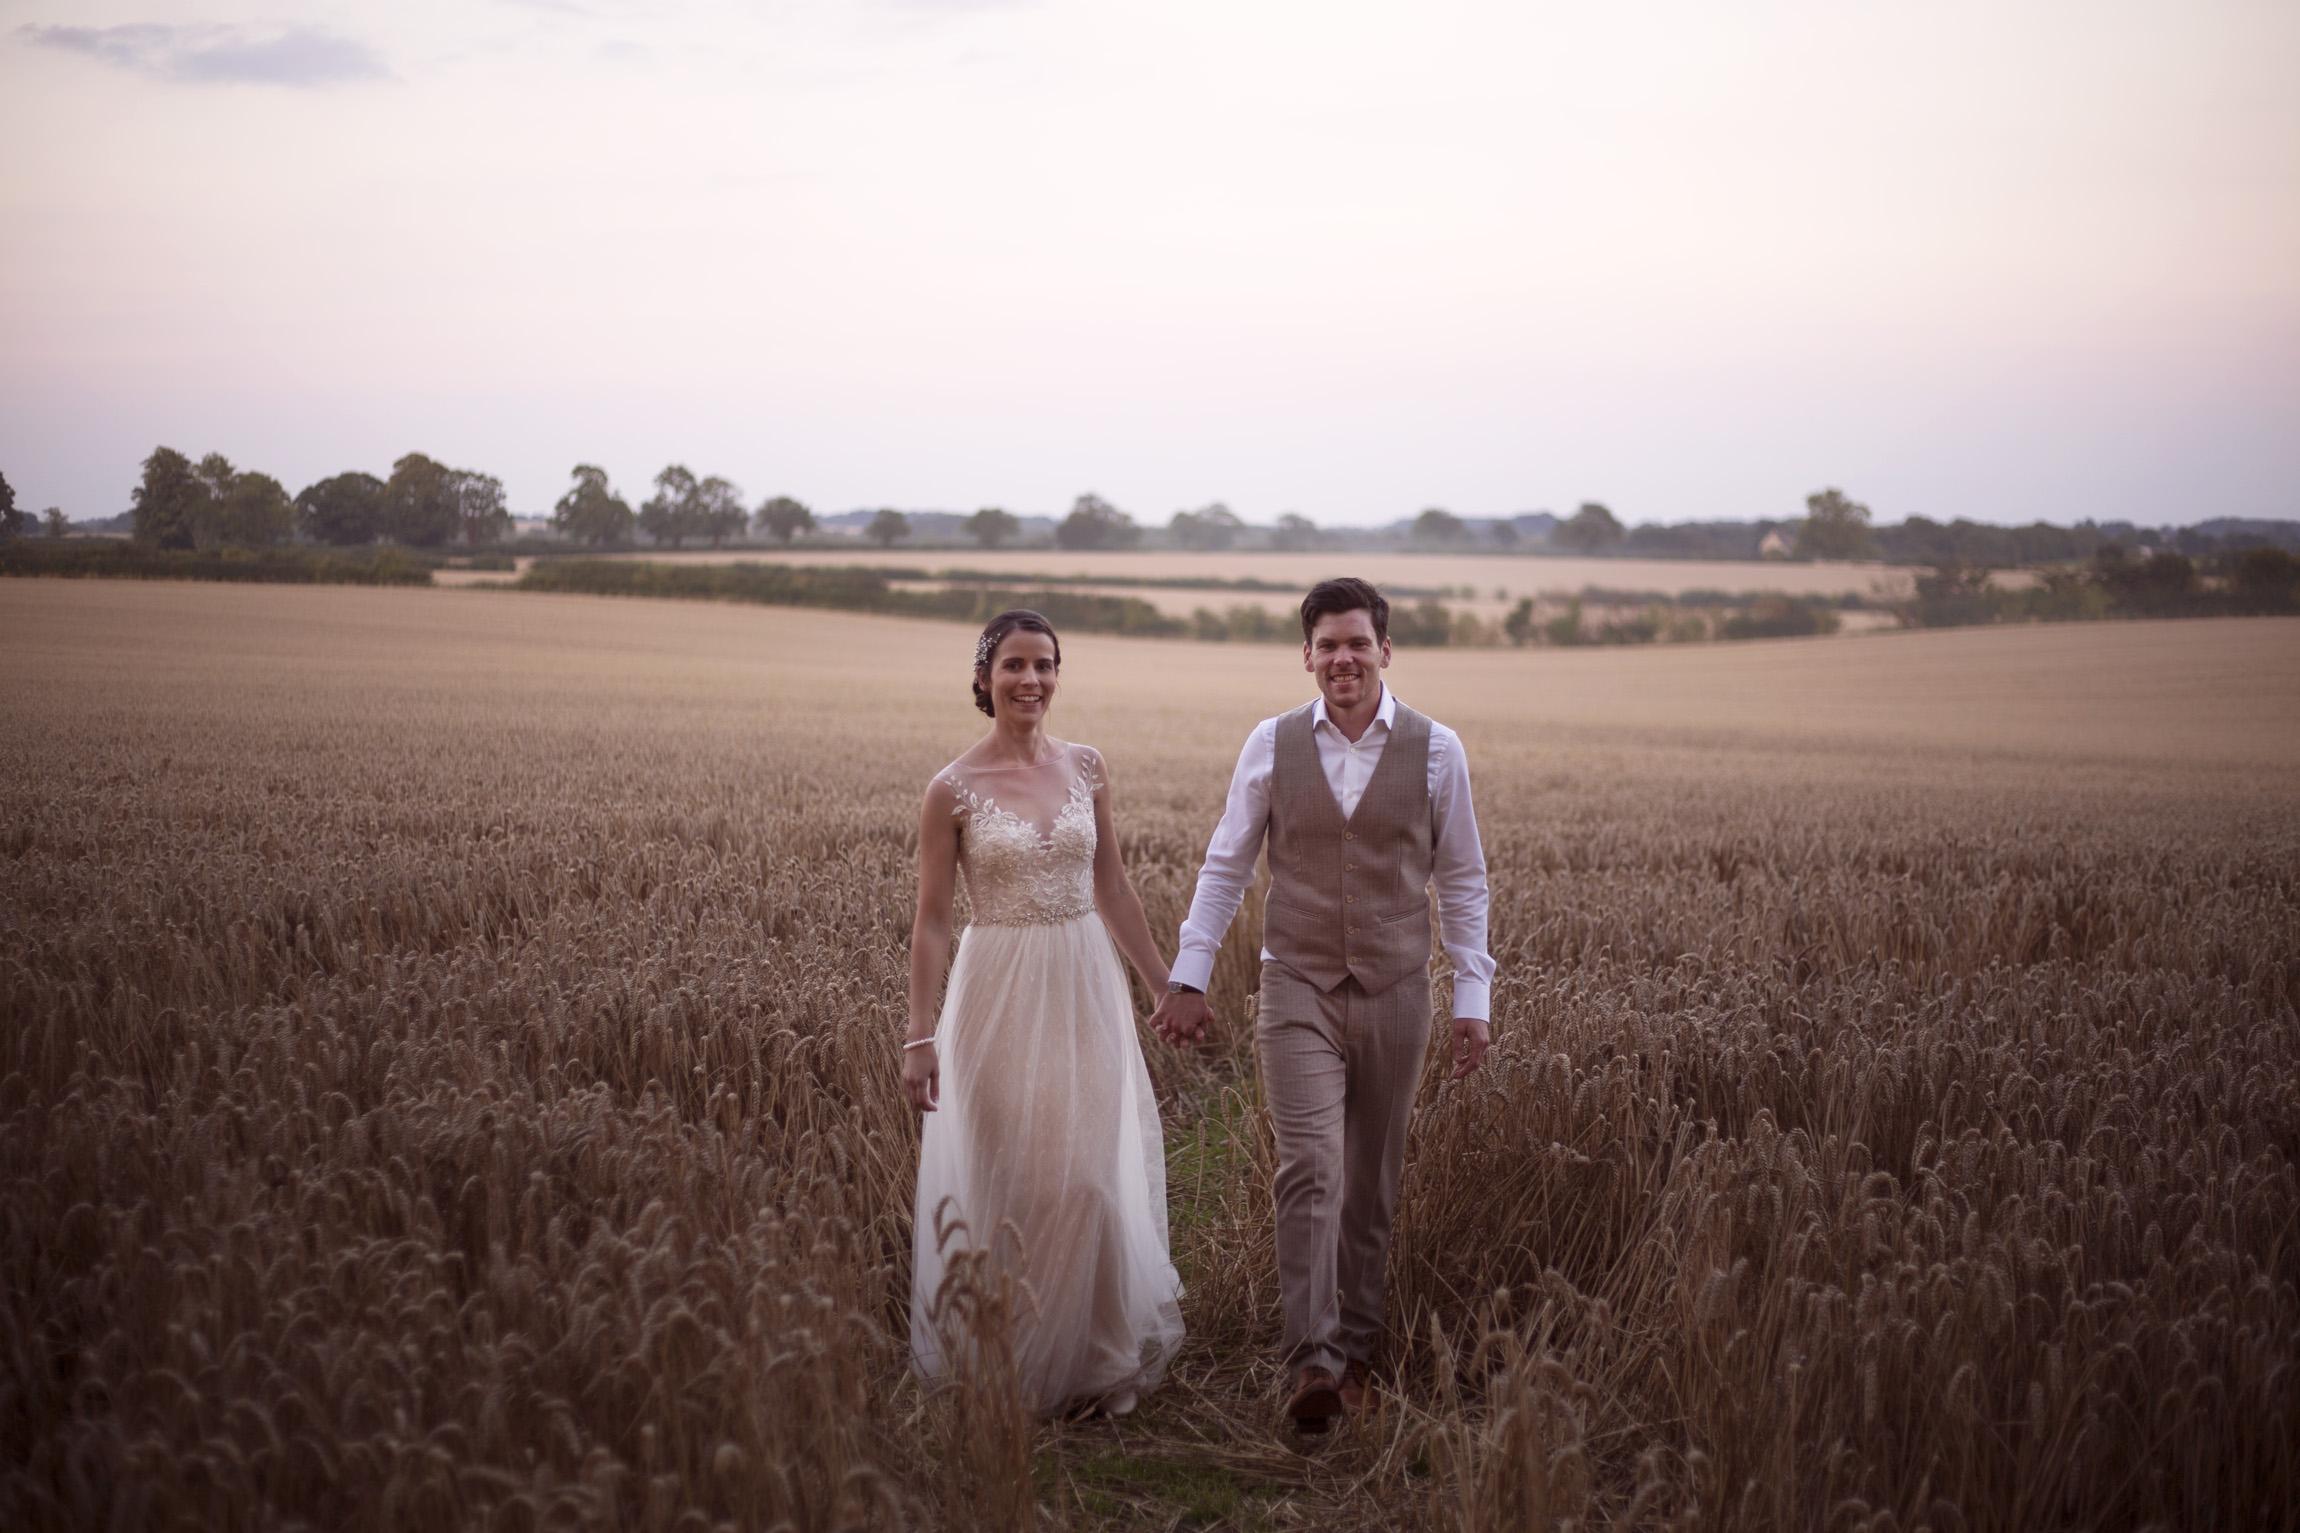 Holding hands bride and groom portrait shoot in cornfield Cripps barn outdoor wedding photographer